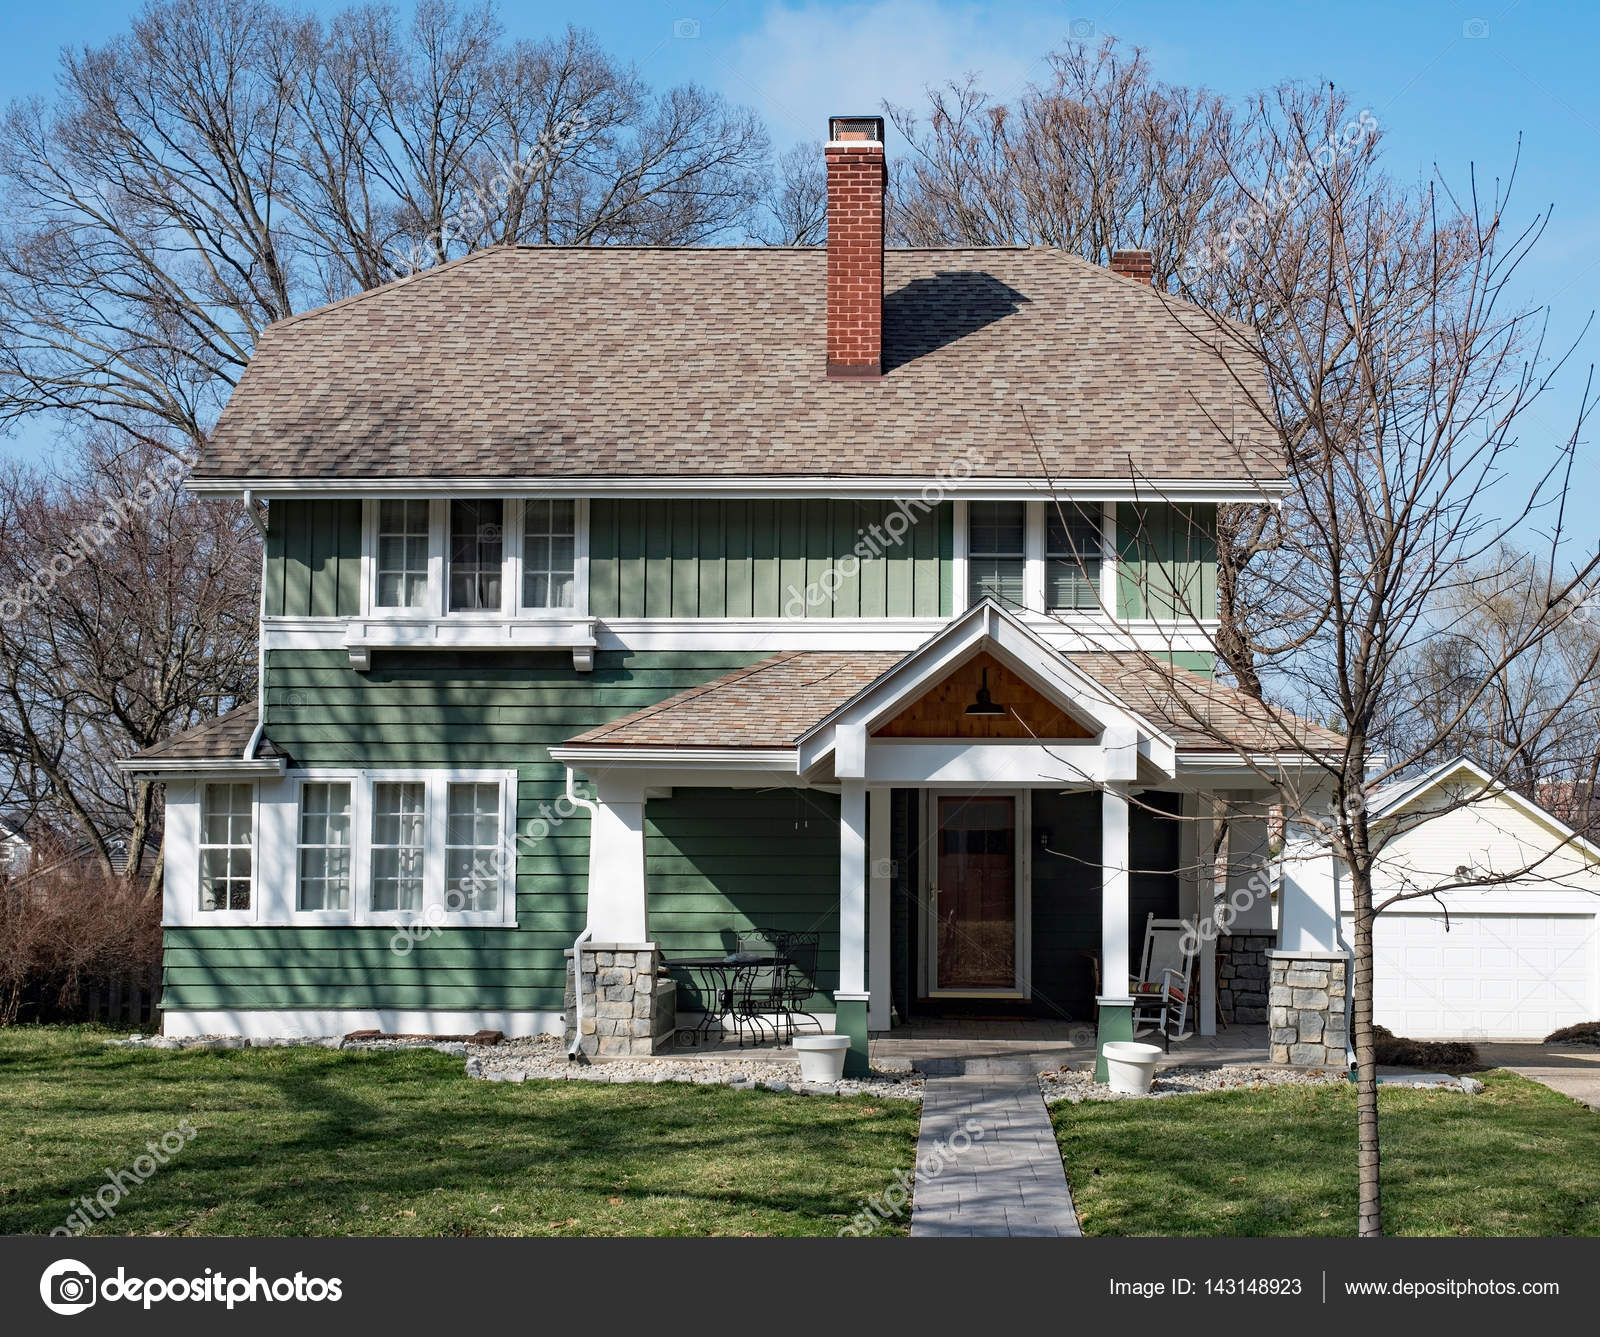 Grünes Haus mit Walmdach — Stockfoto © Lawcain #143148923